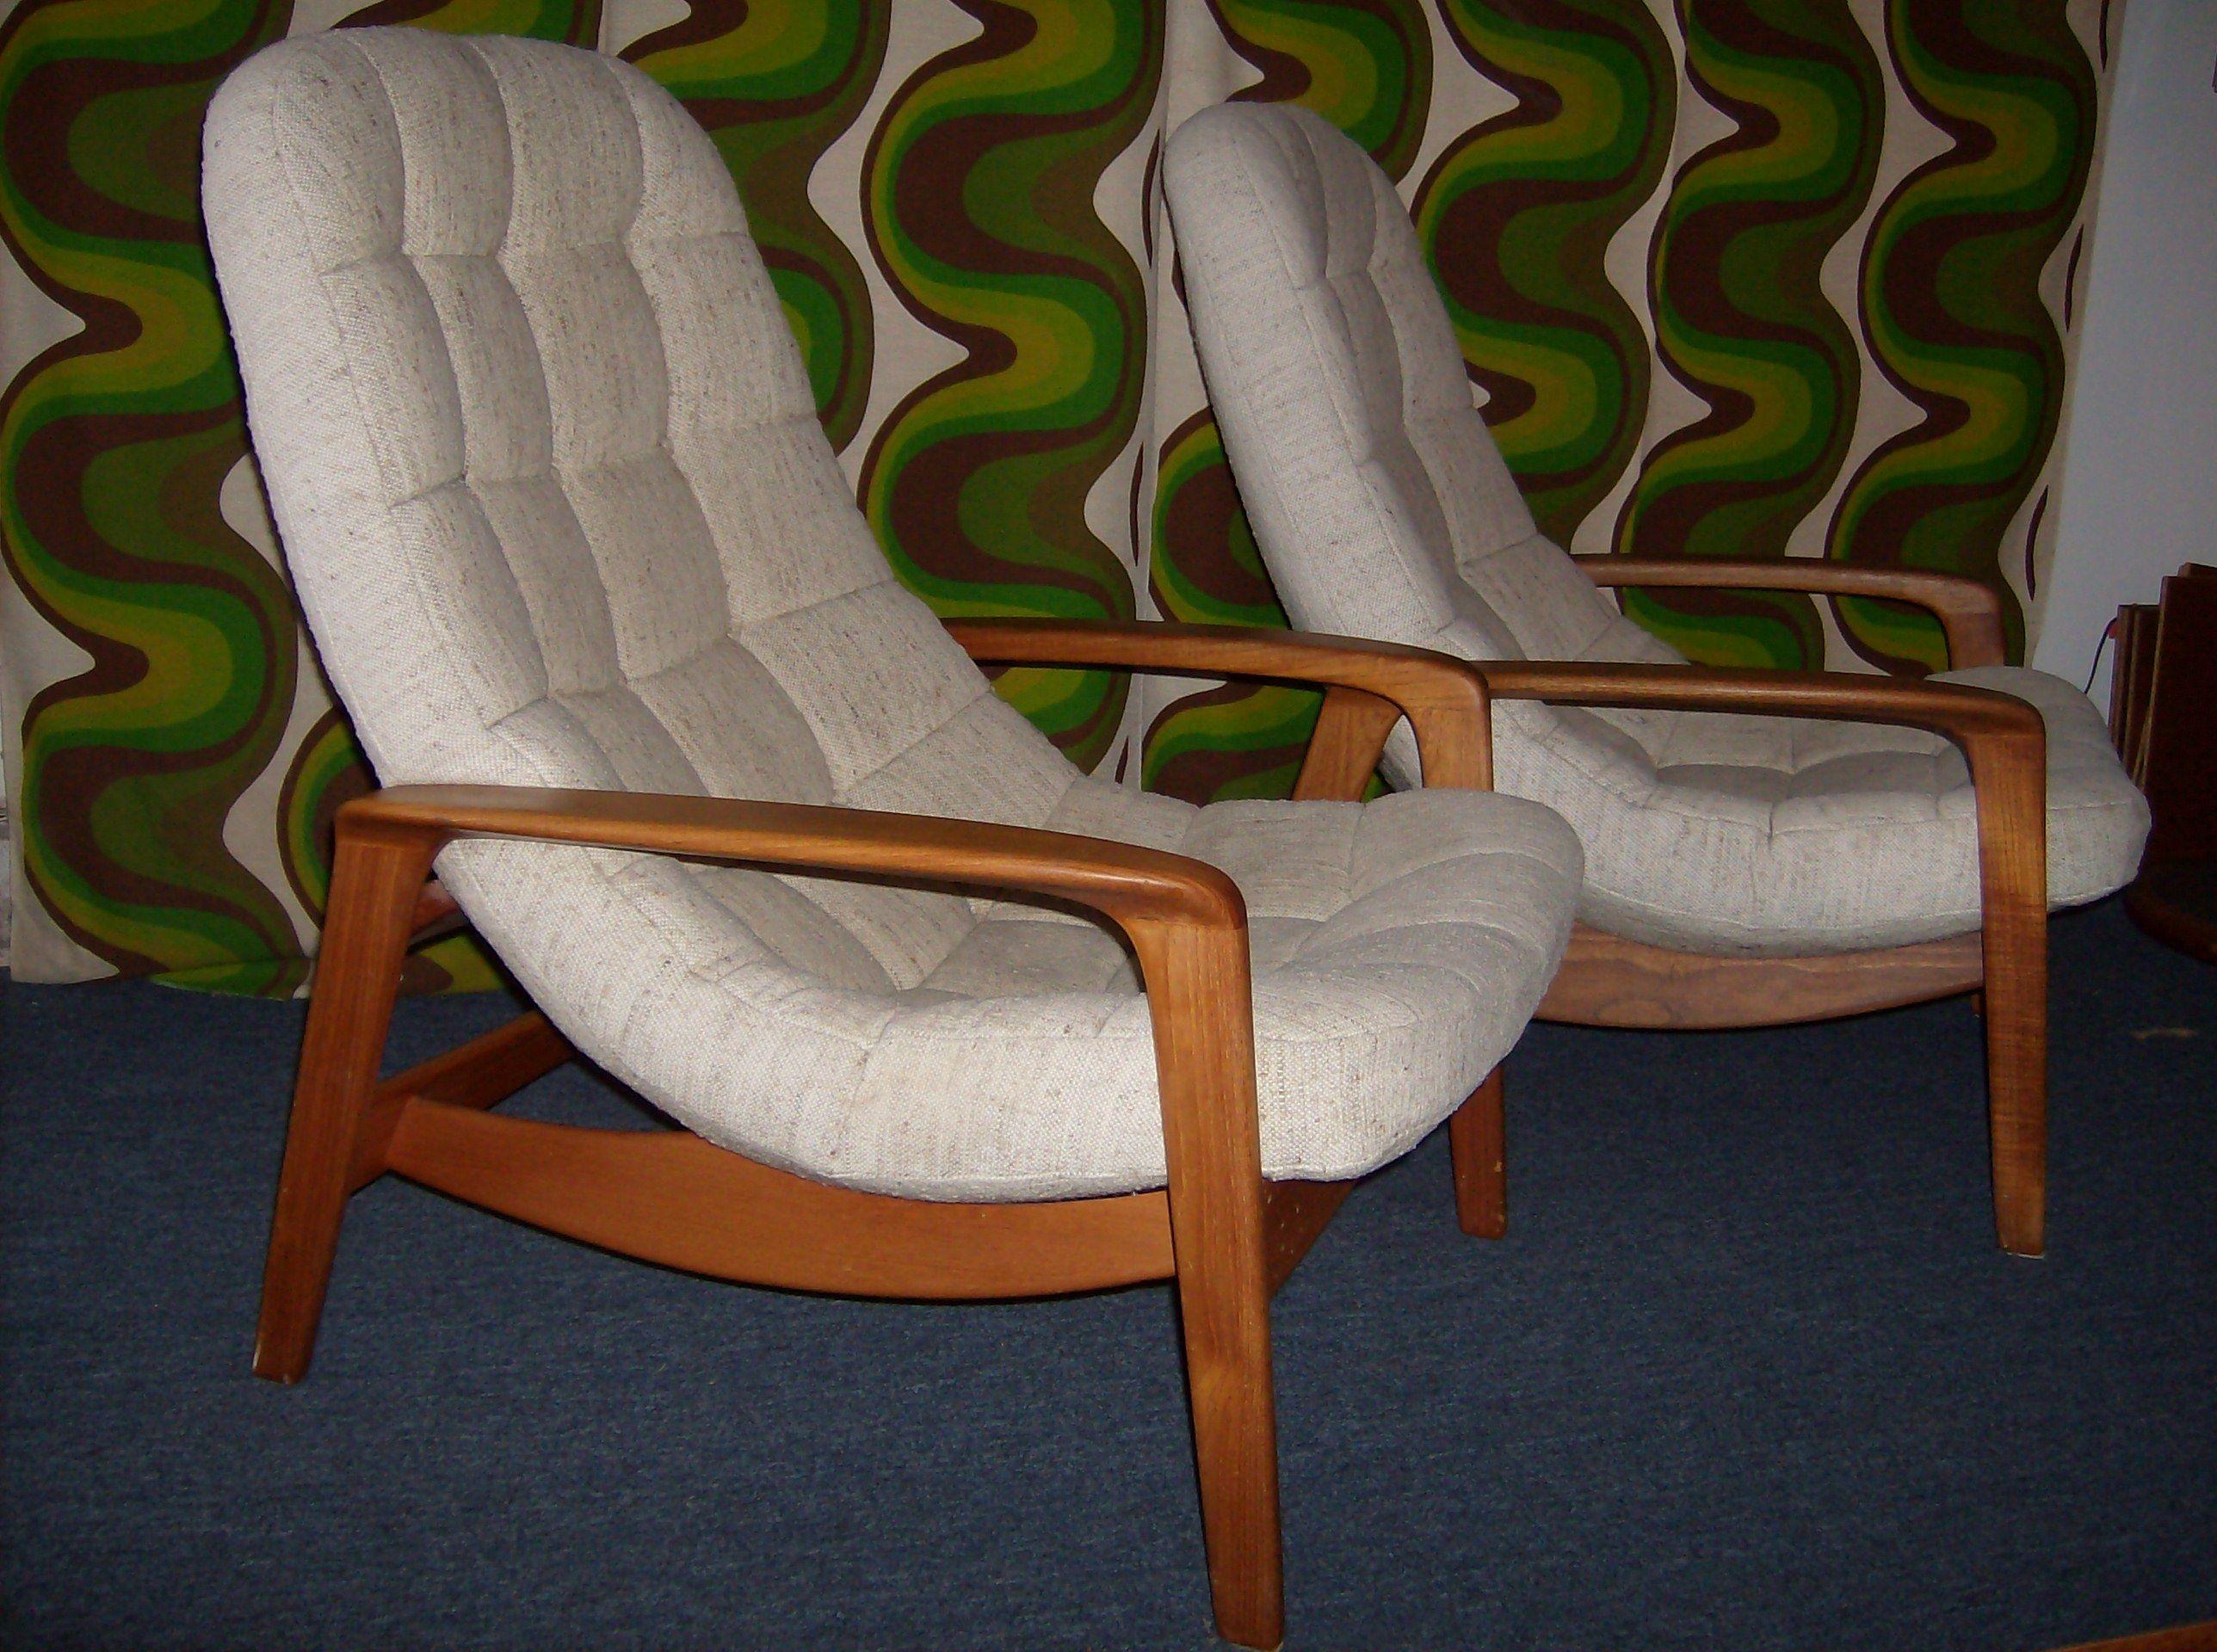 Scoop Chairs Modern Furniture Furniture Showroom